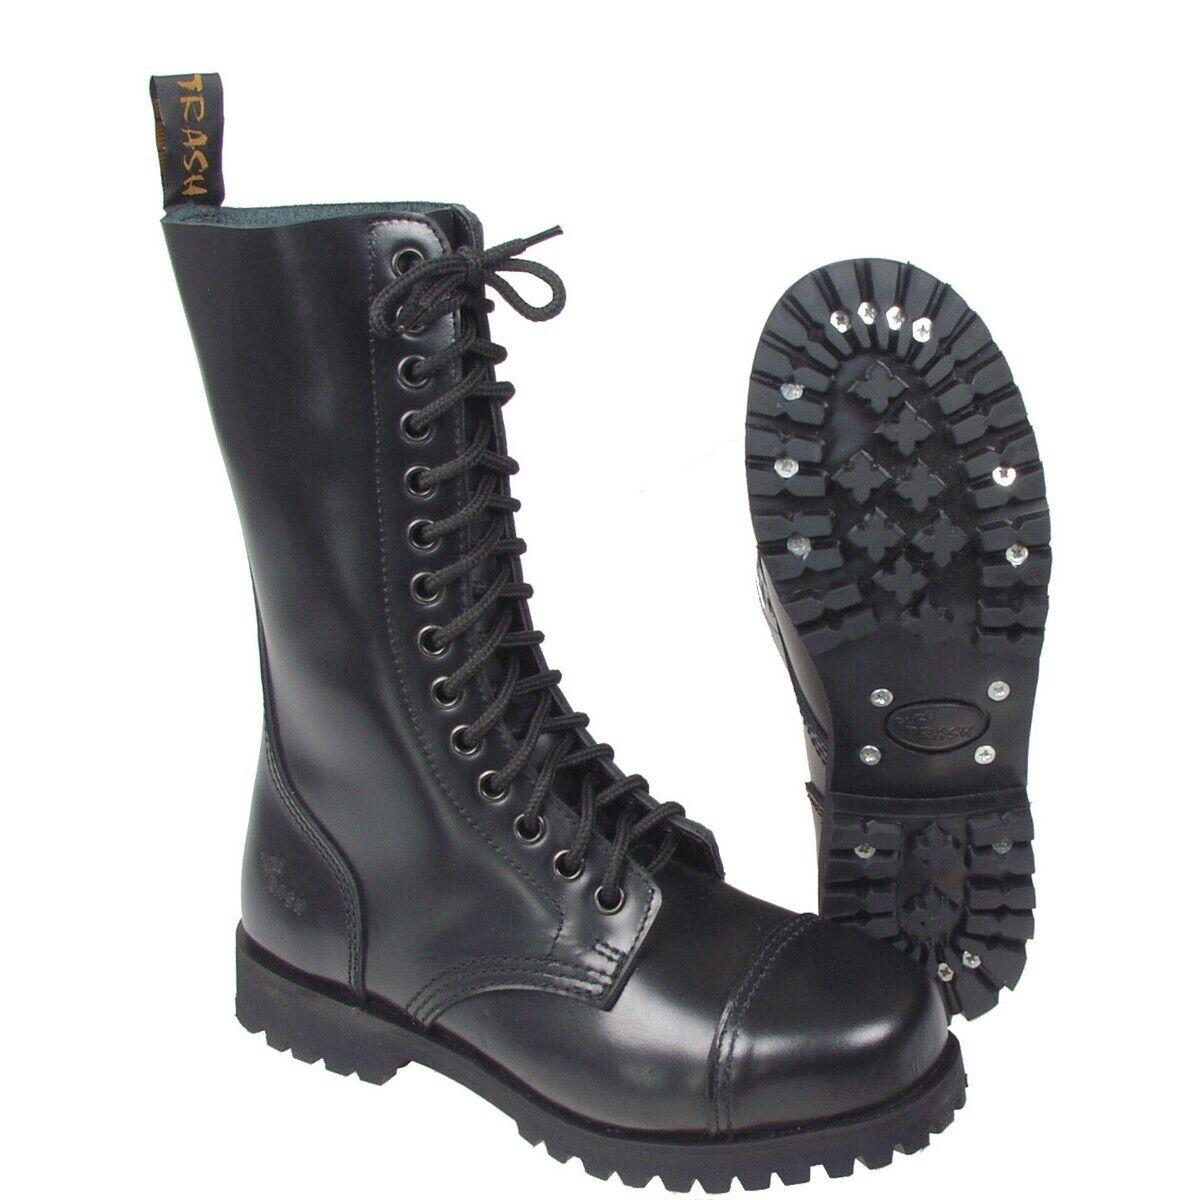 Pur Trash 14 agujeros botas zapatos botas Gothic imperial Style UK negro nuevo